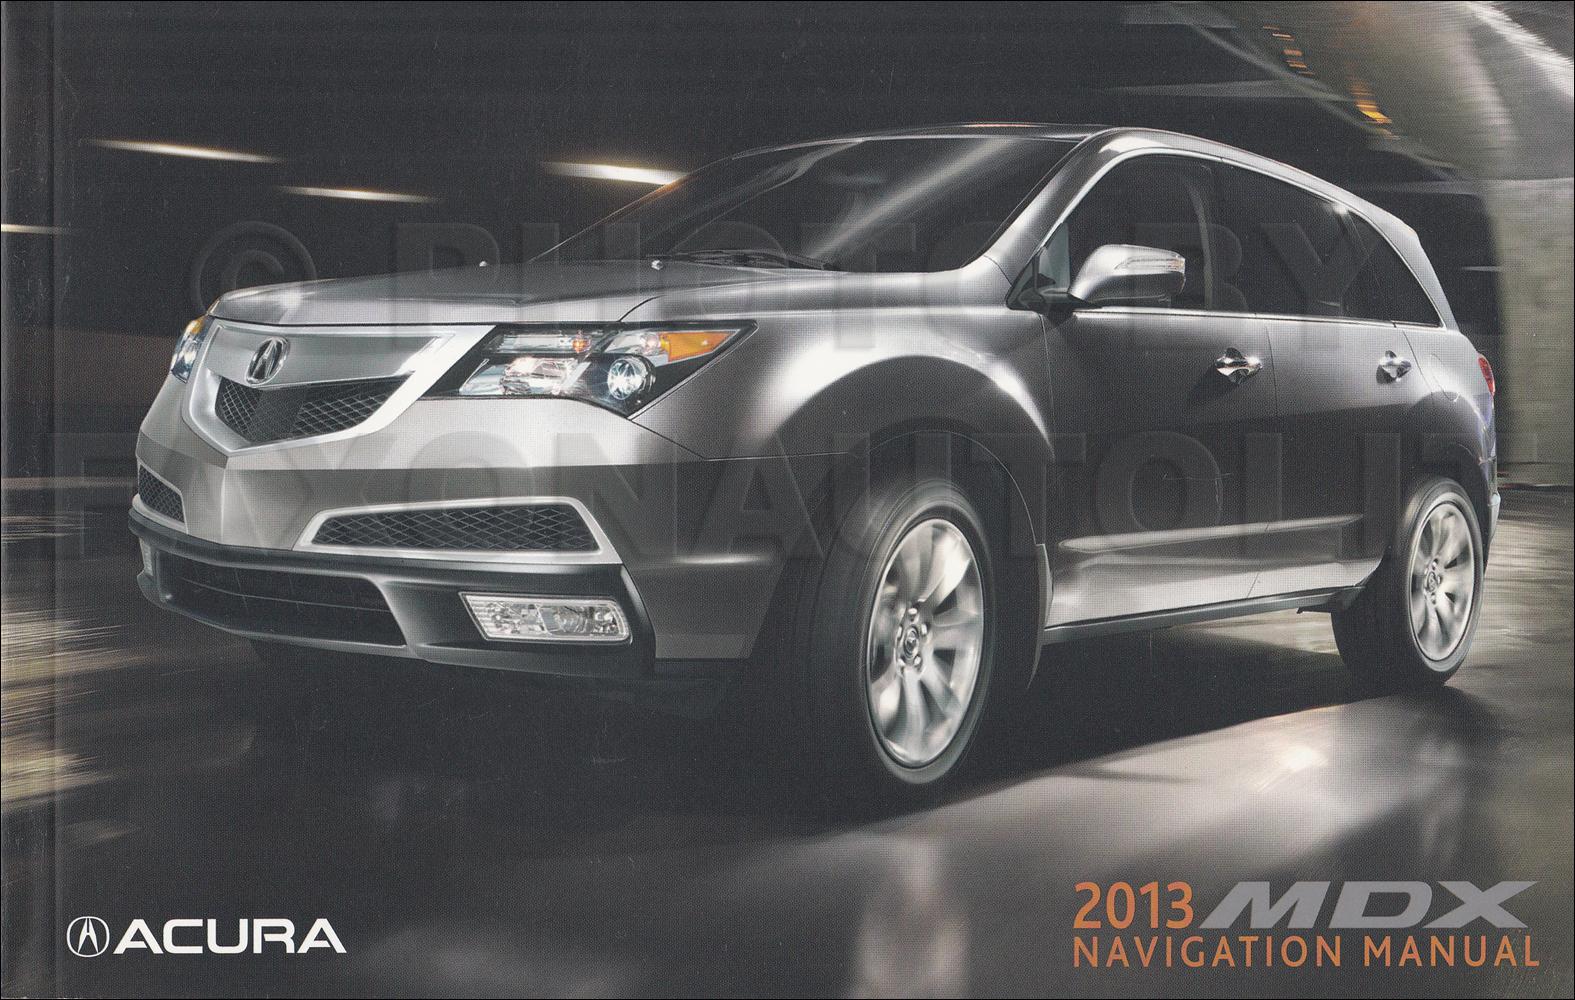 2007 acura mdx owners manual free owners manual u2022 rh wordworksbysea com 2017 Acura MDX 2013 Acura MDX